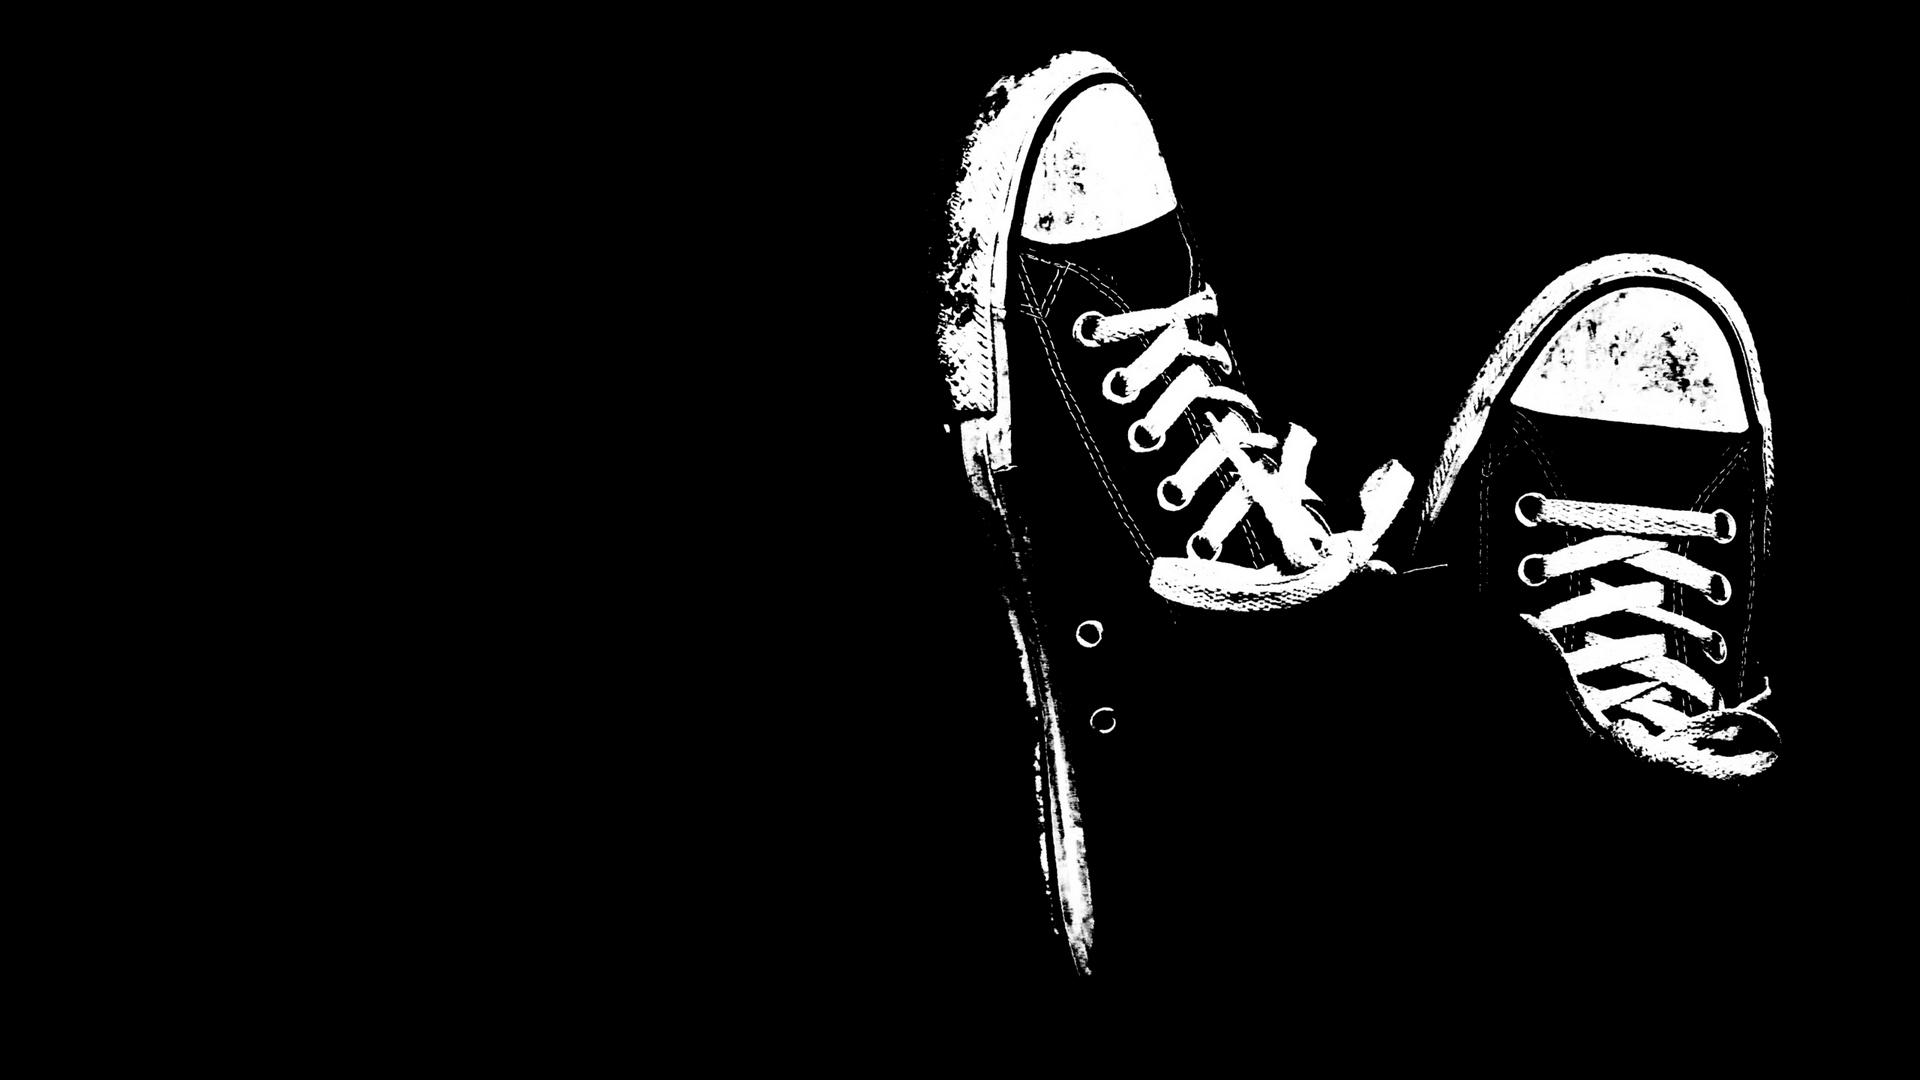 sneakers black and white-wallpaper-1920x1080.jpg